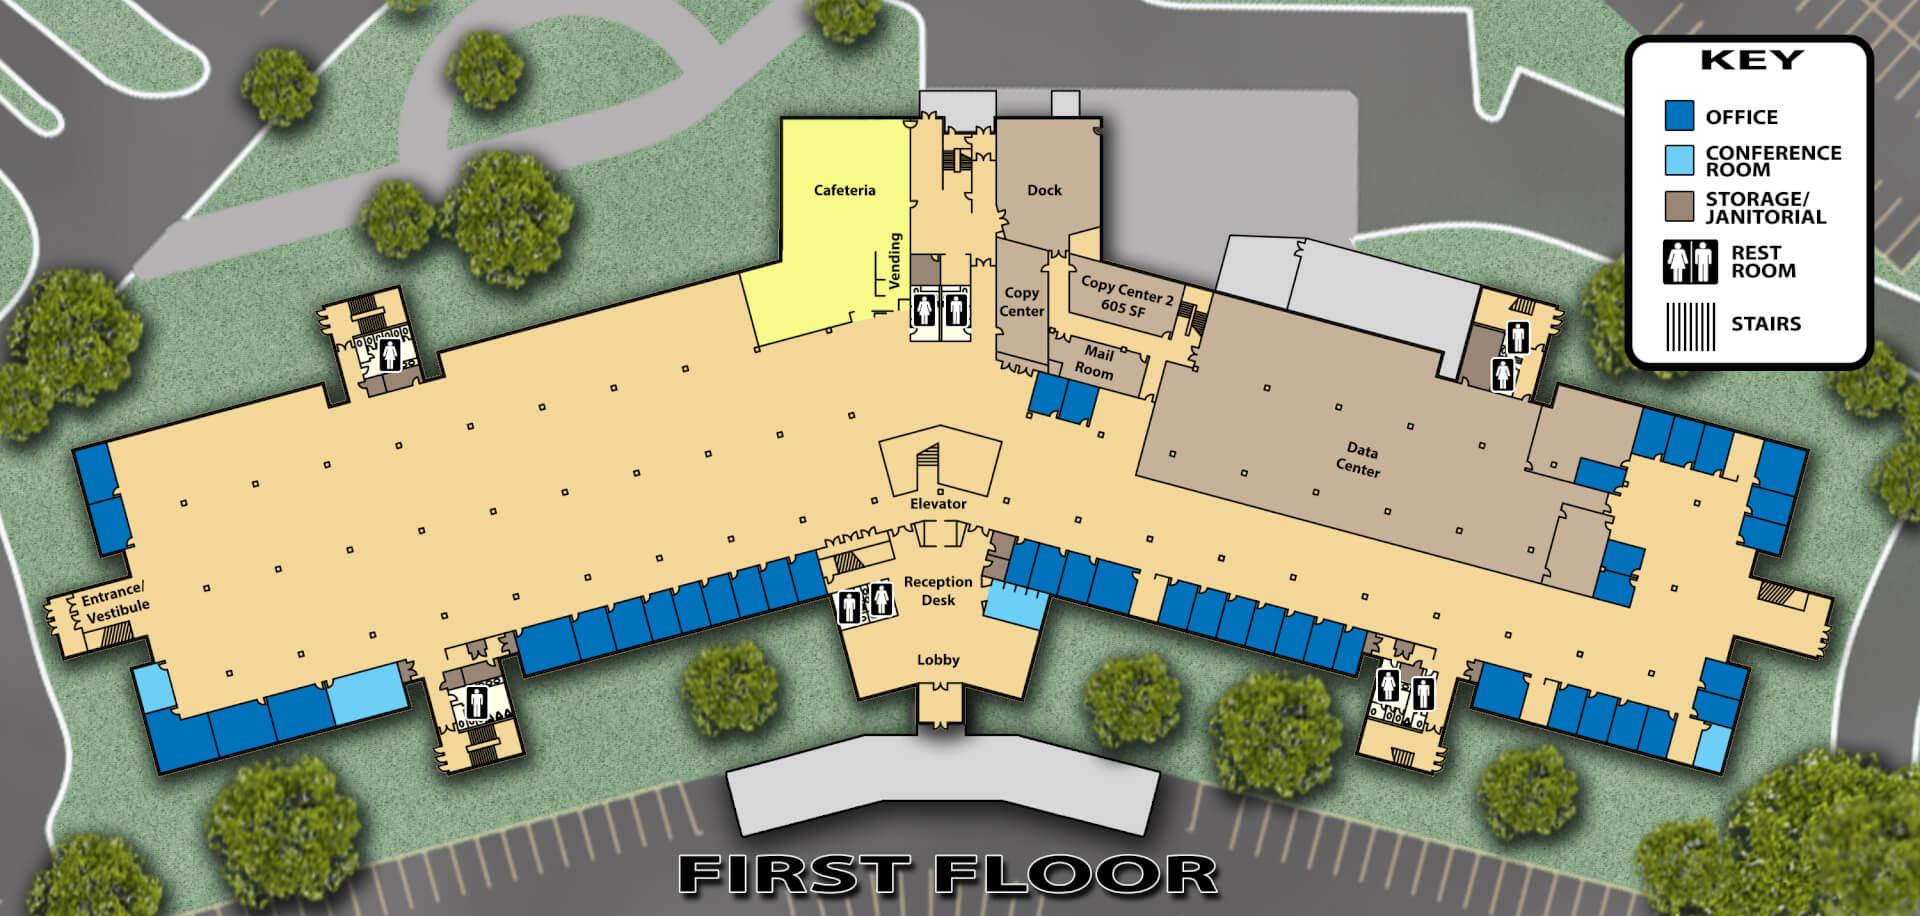 cad services - floor plan graphic